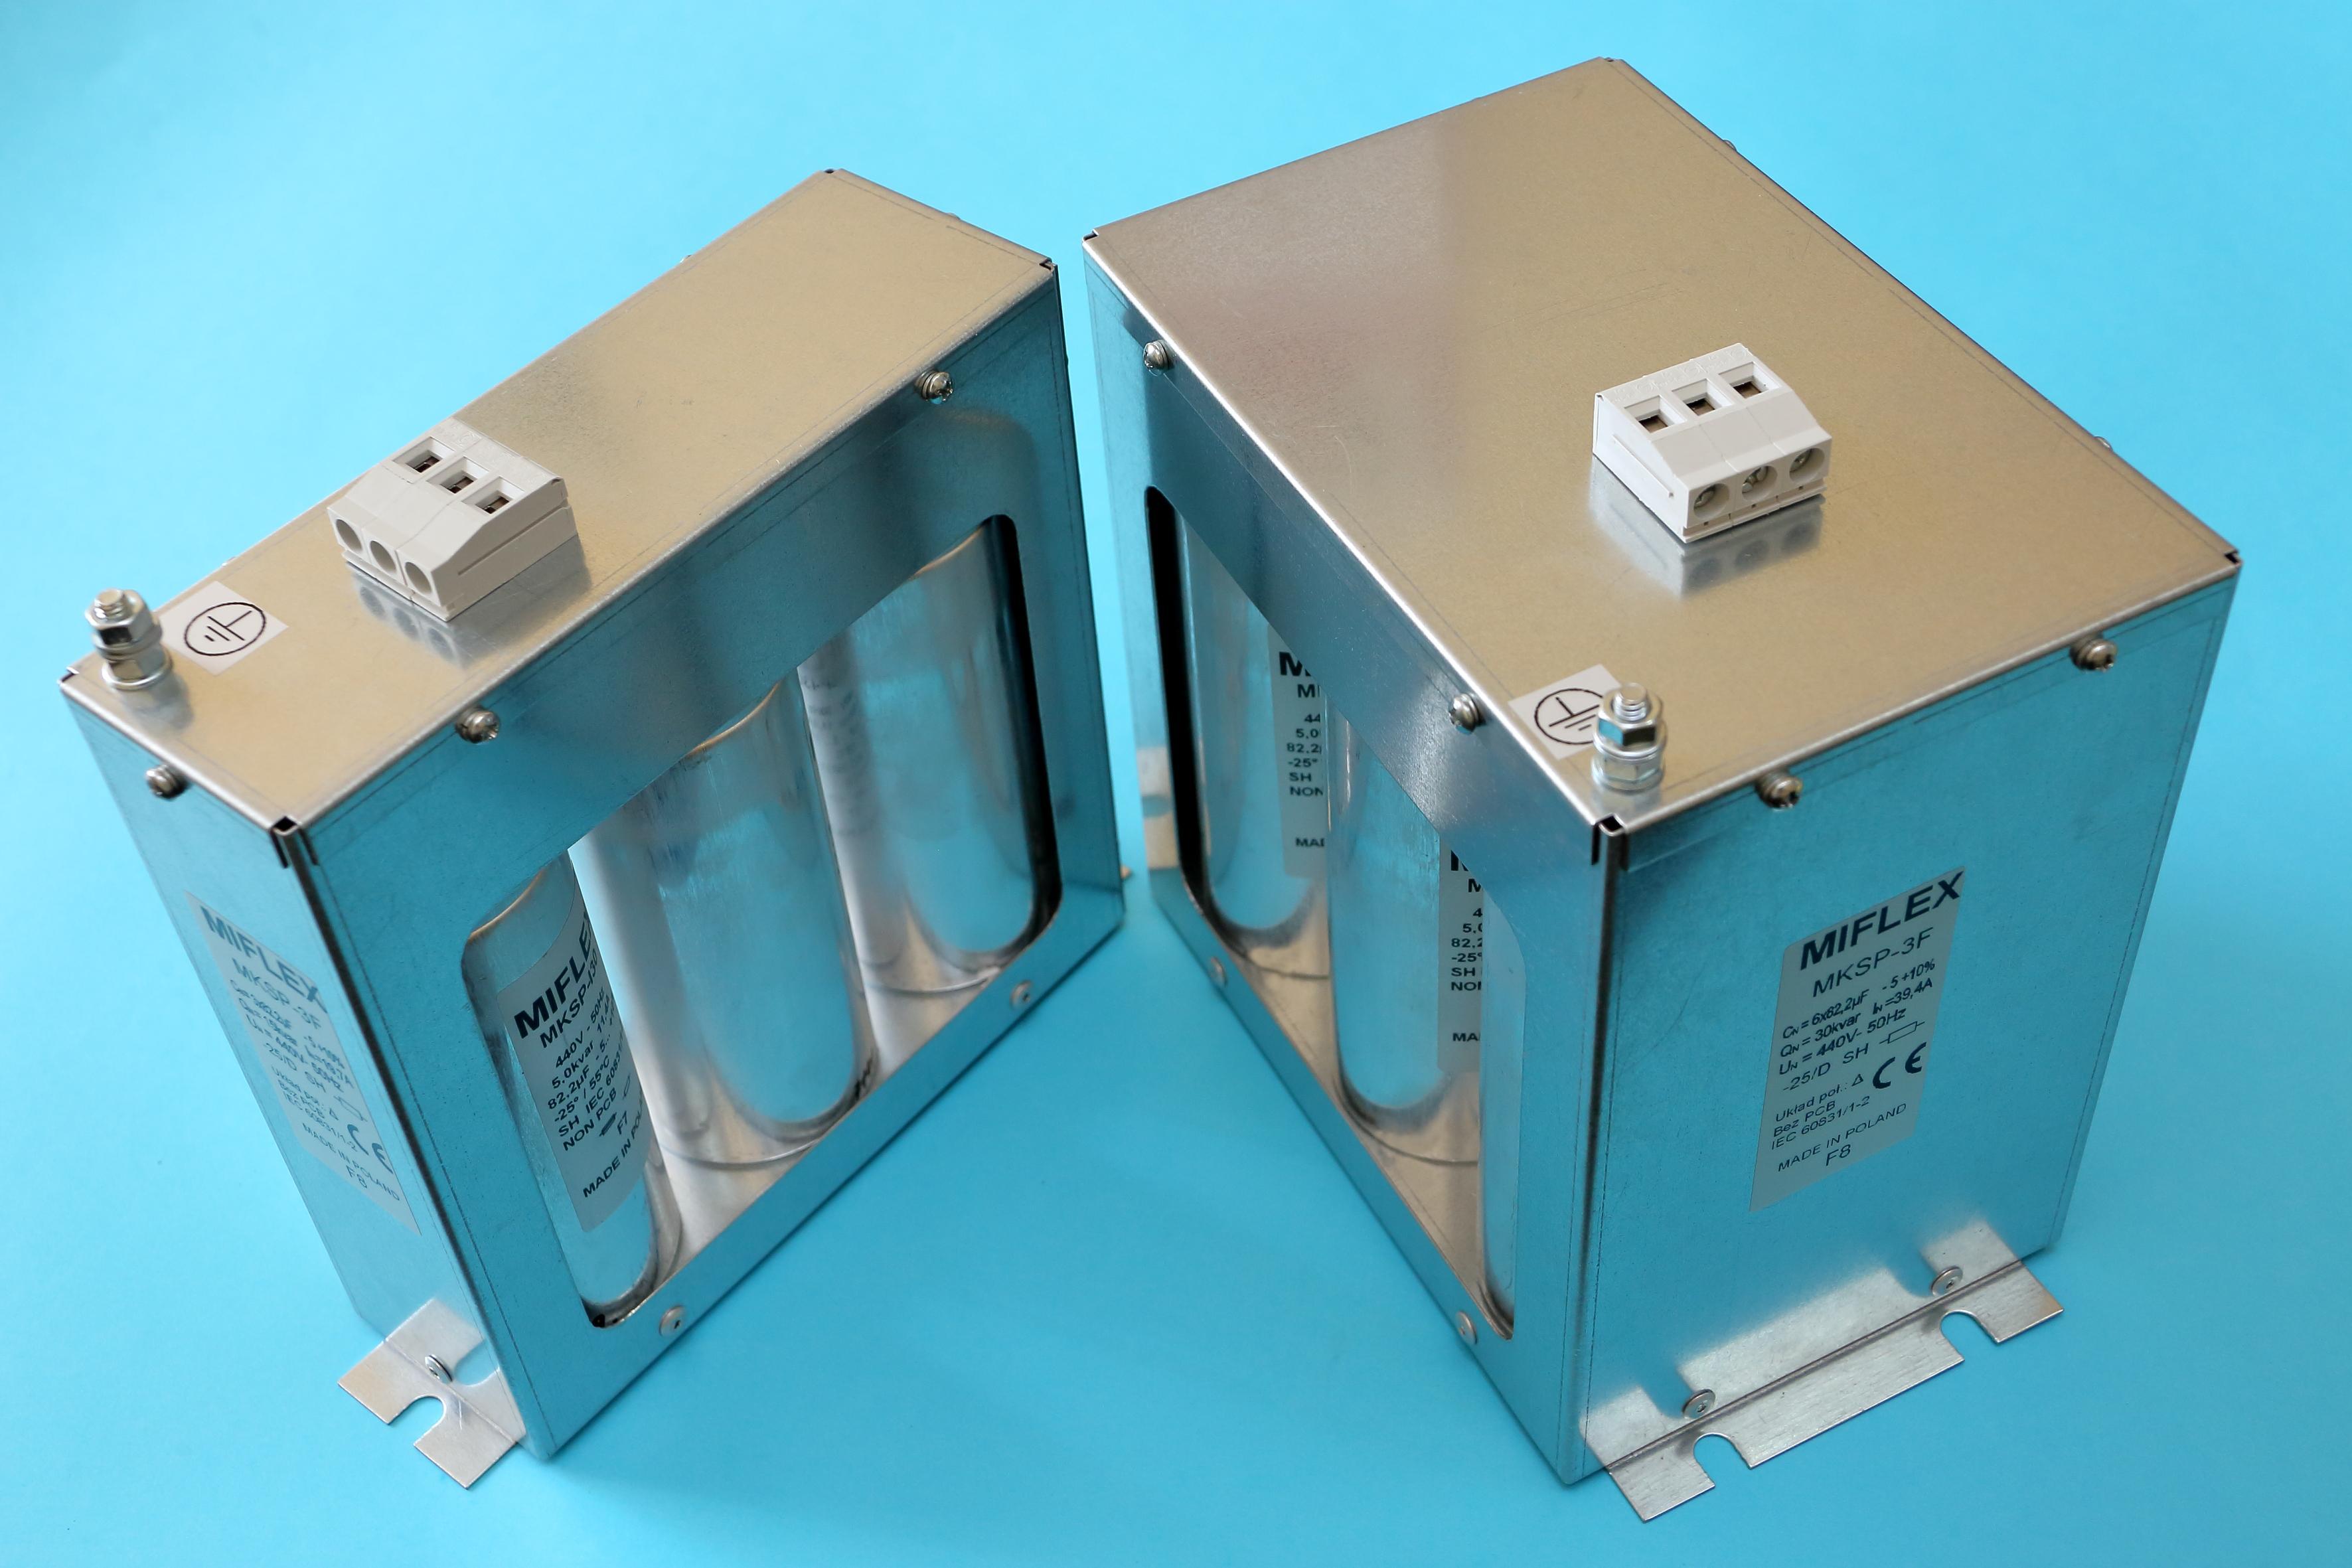 miflex-kondensatory-trojfazowe-do-kompensacji-n3